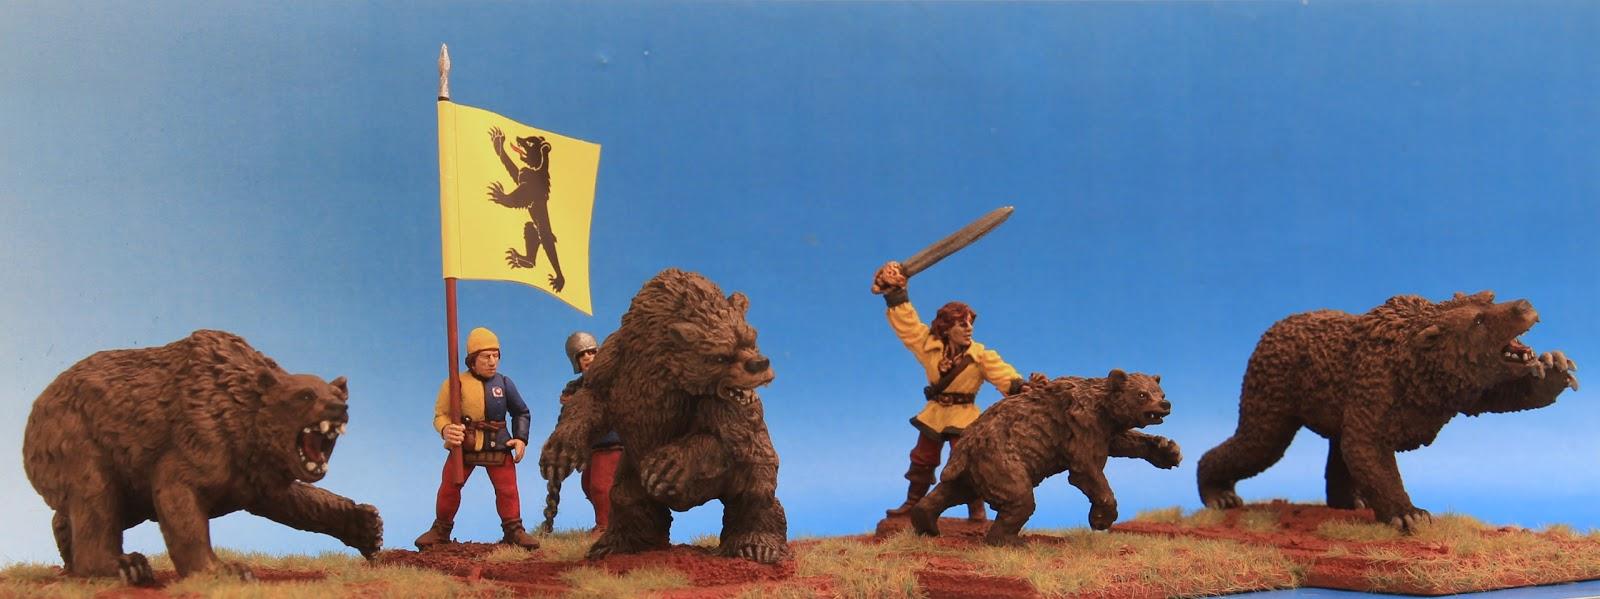 Cor blog me!: Bear Country